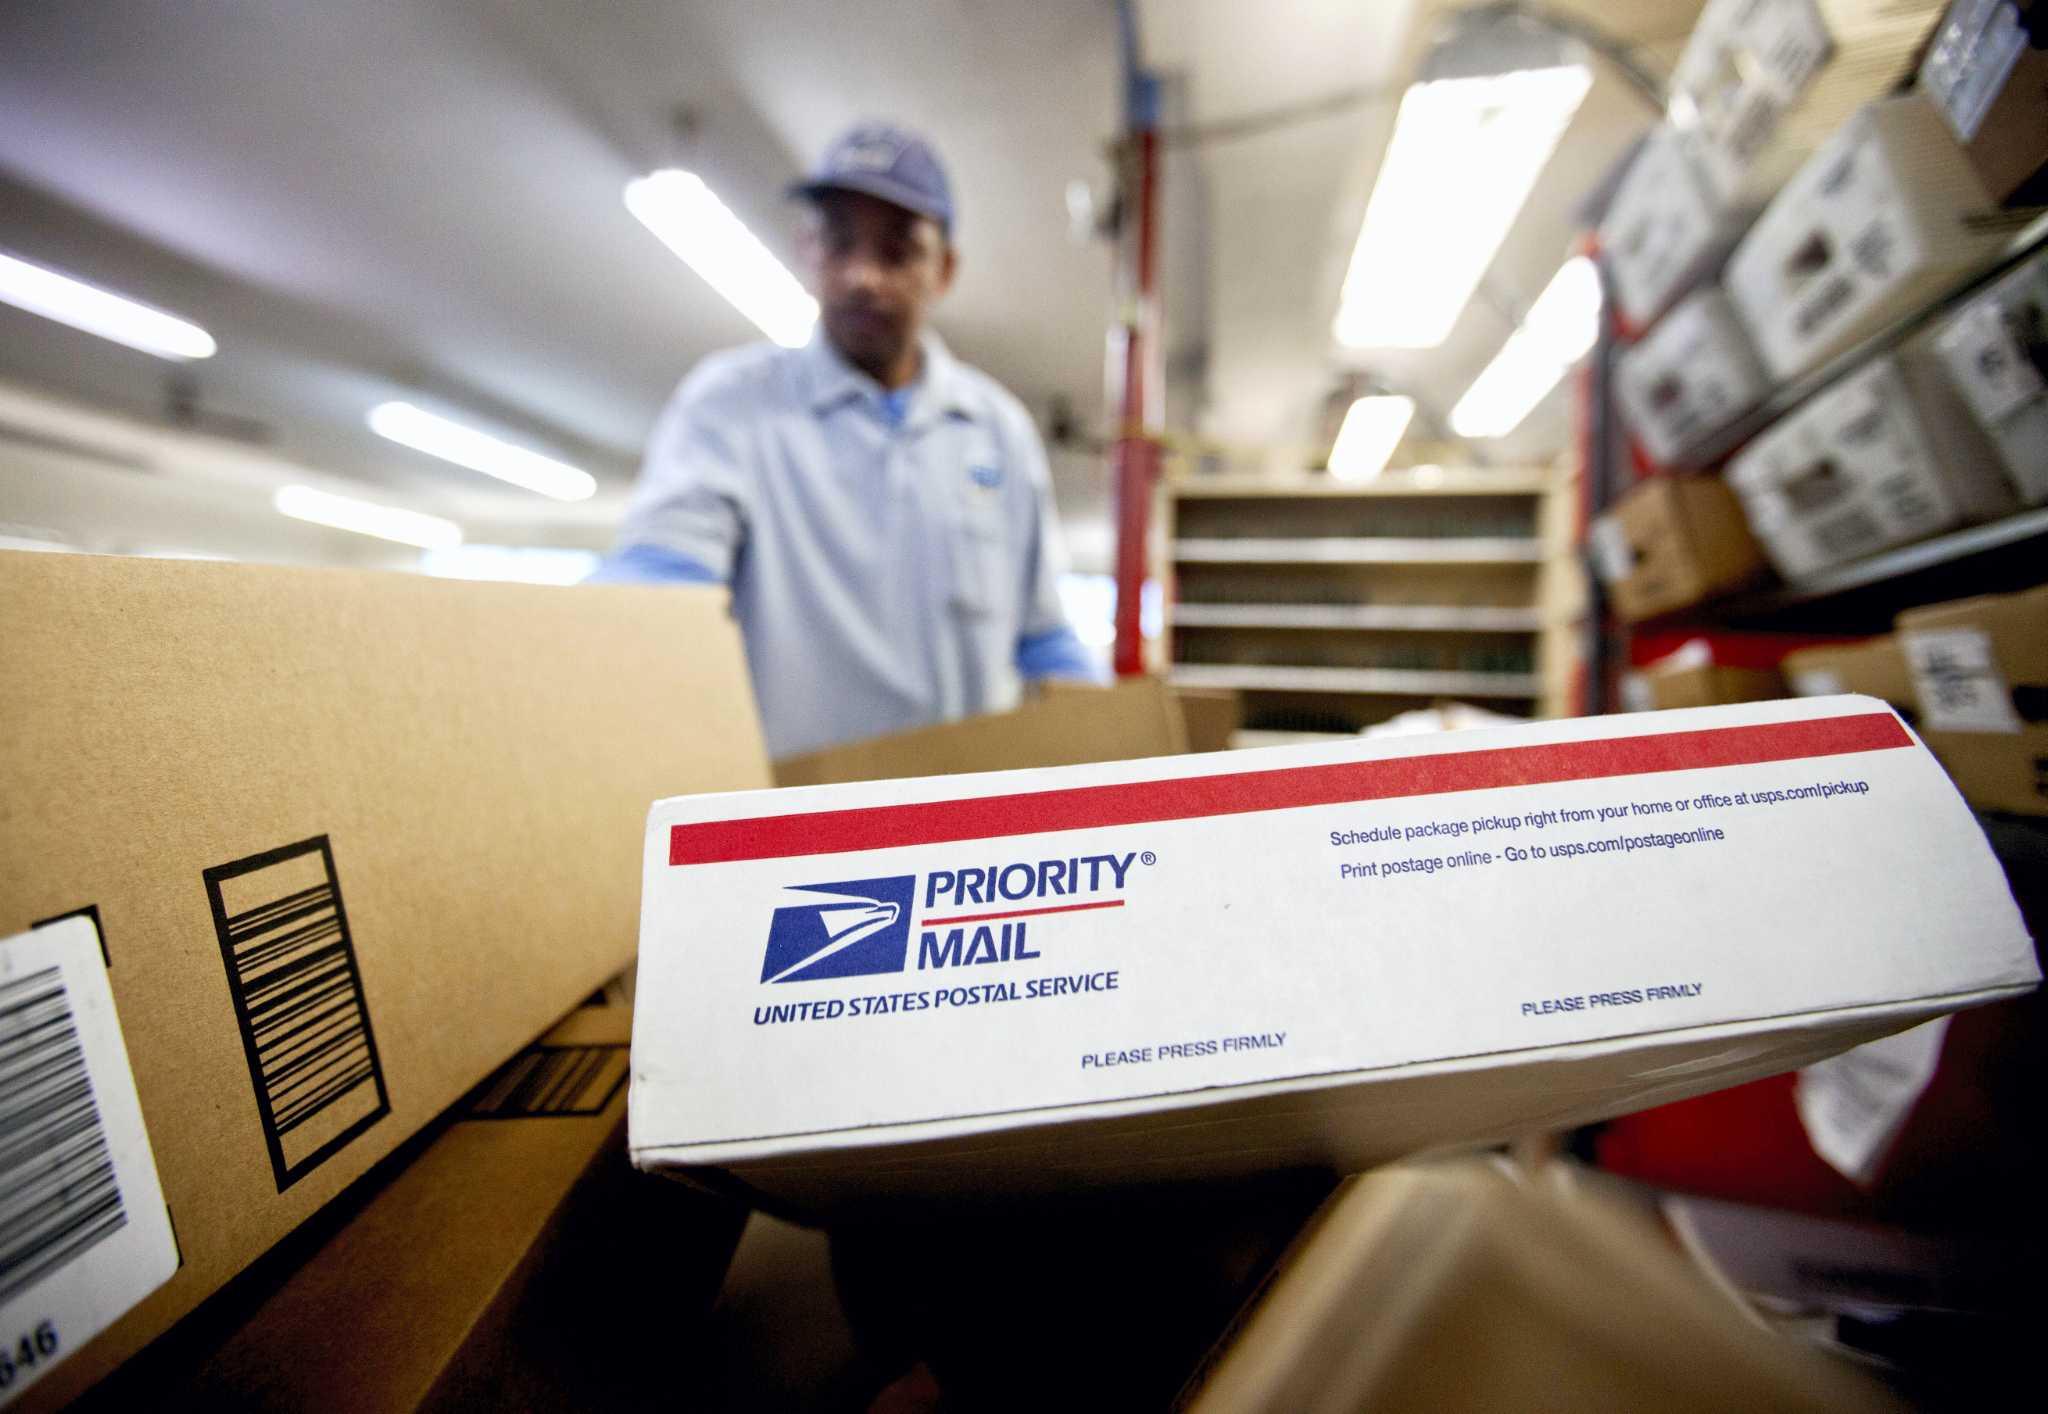 the postal service band logo